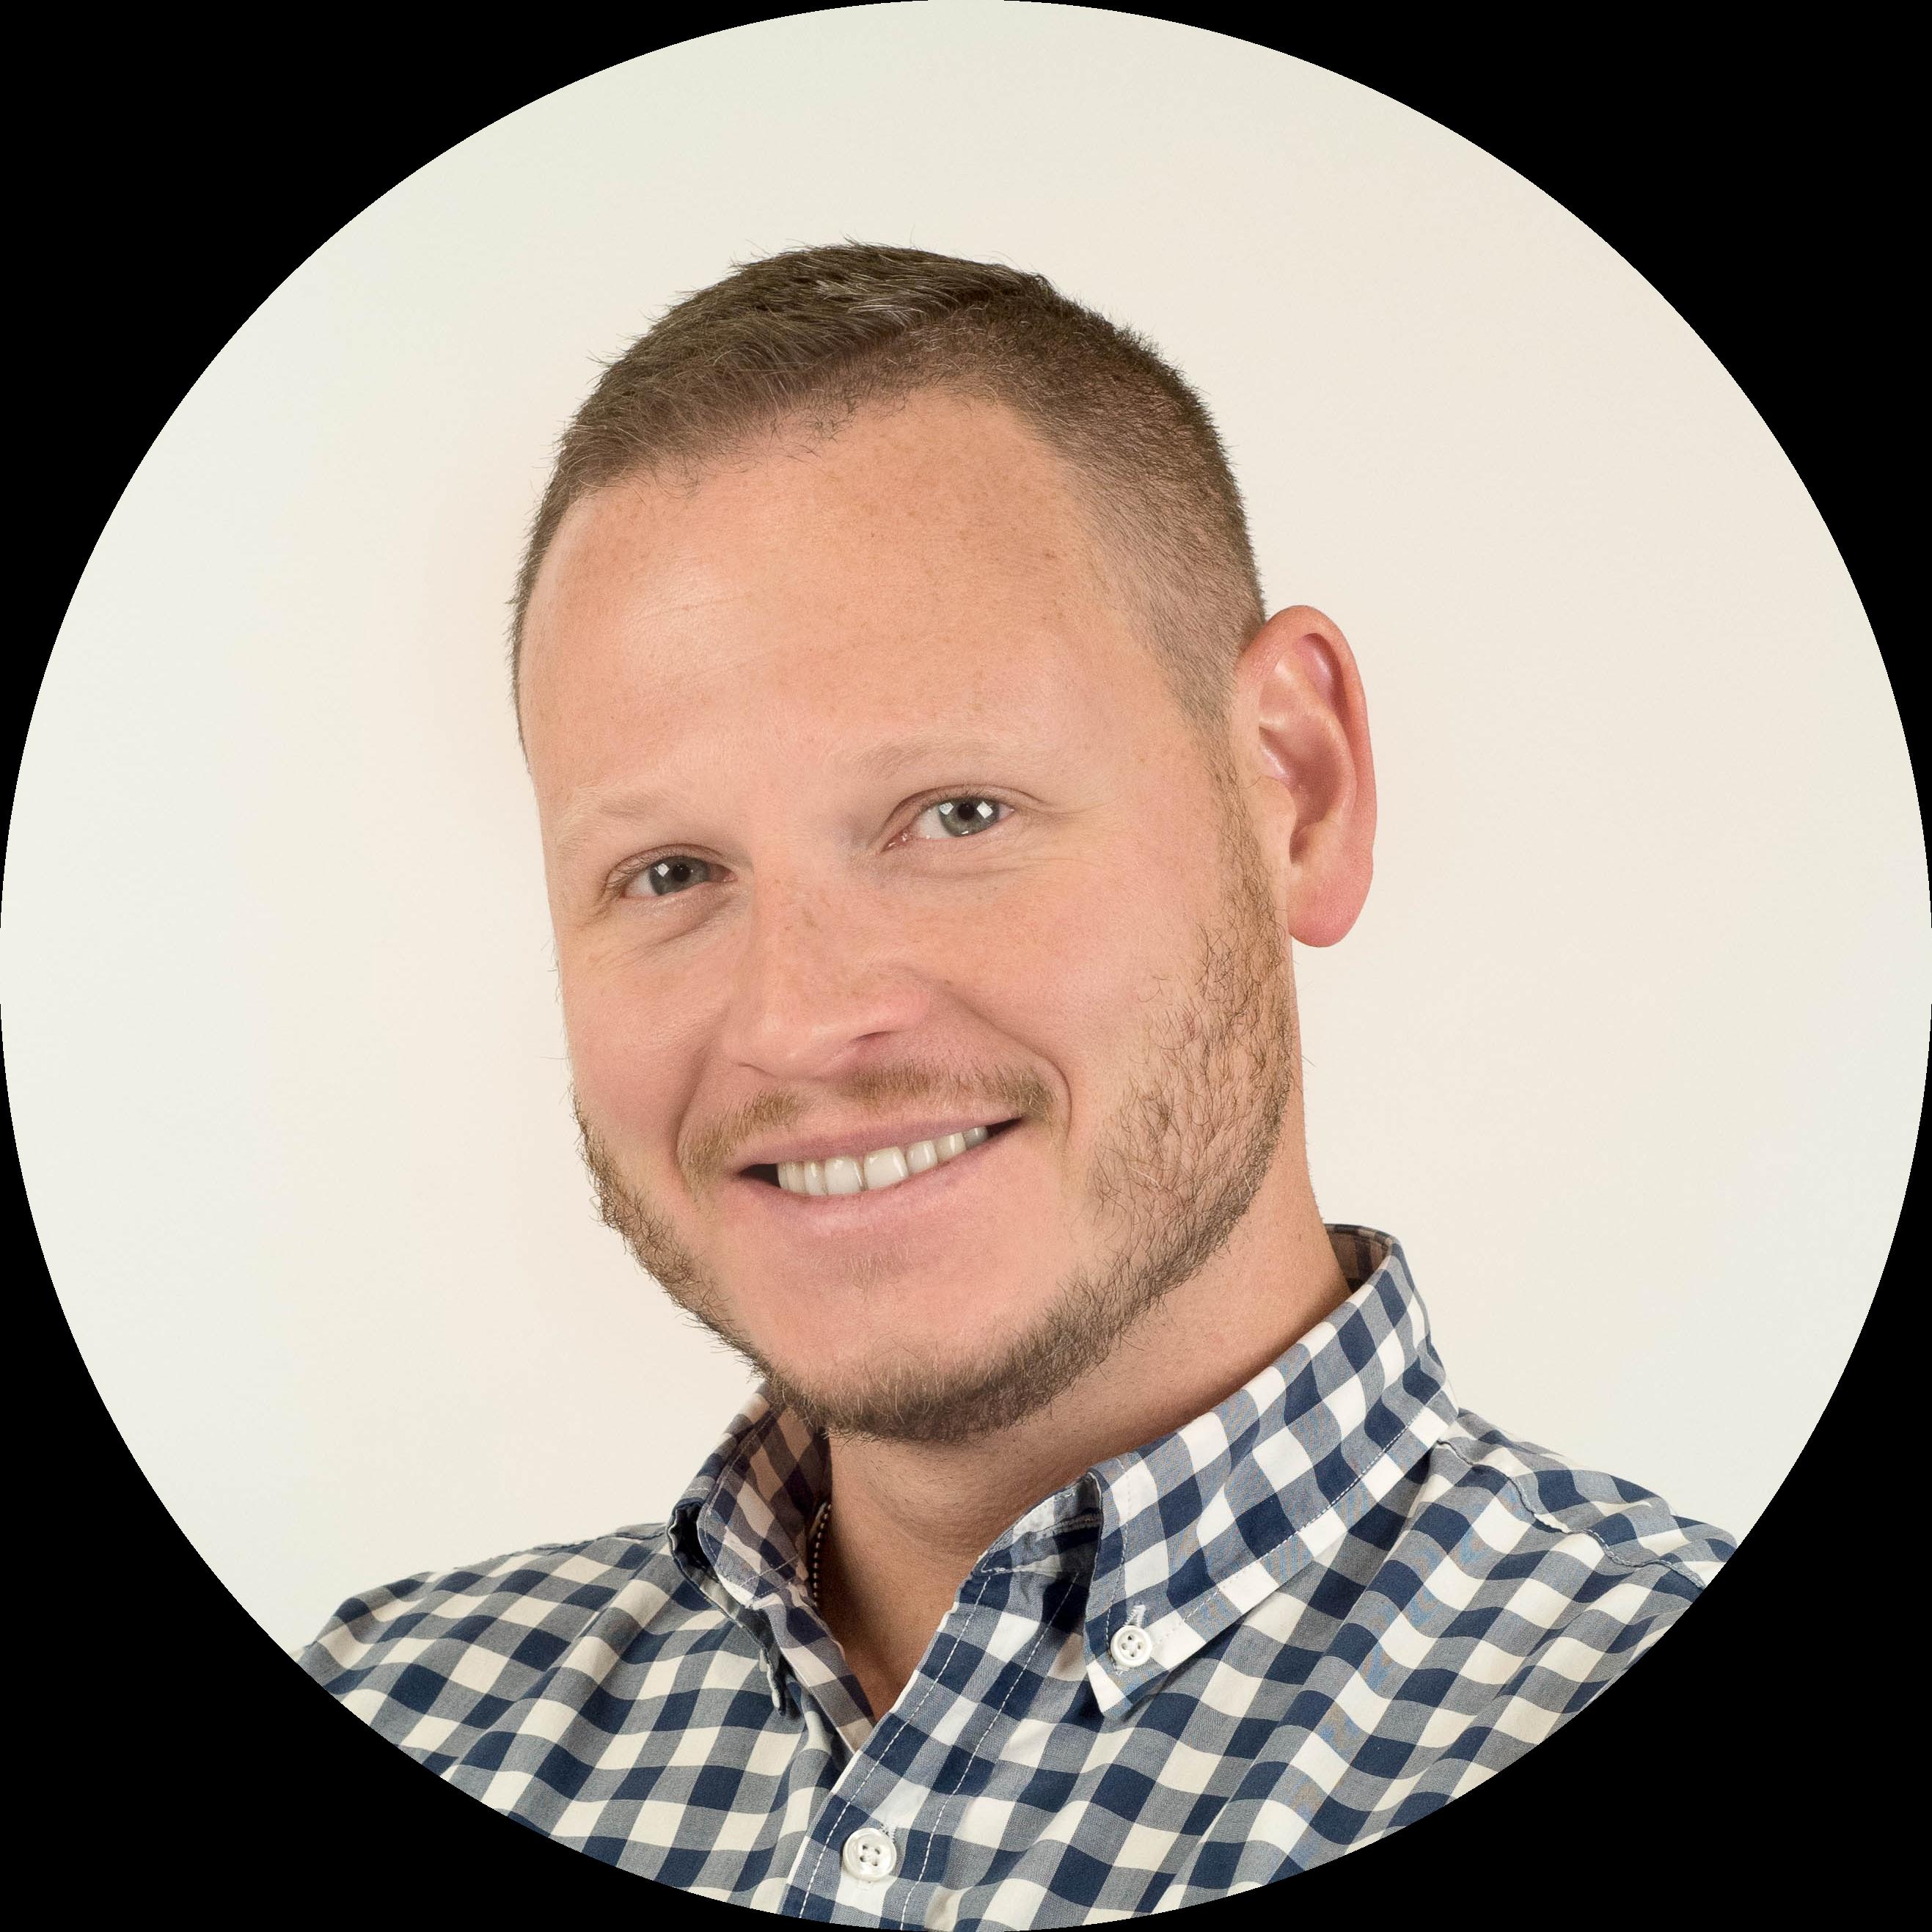 Ross Garrett | VP of Marketing at Cloud Elements